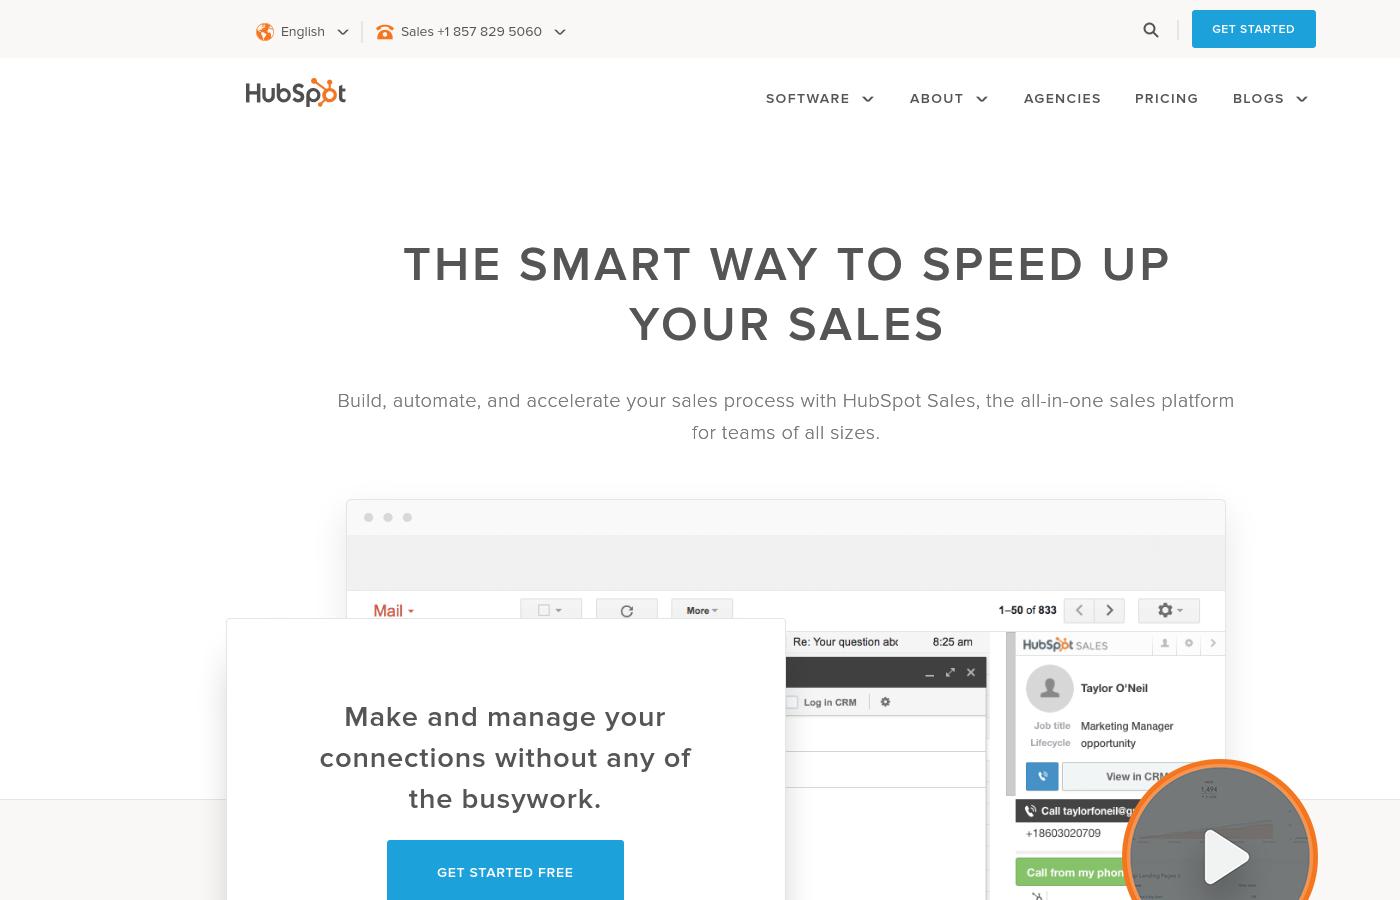 GrowthJunkie Tool | HubSpot | Customer Relationship Mgmt (CRM)